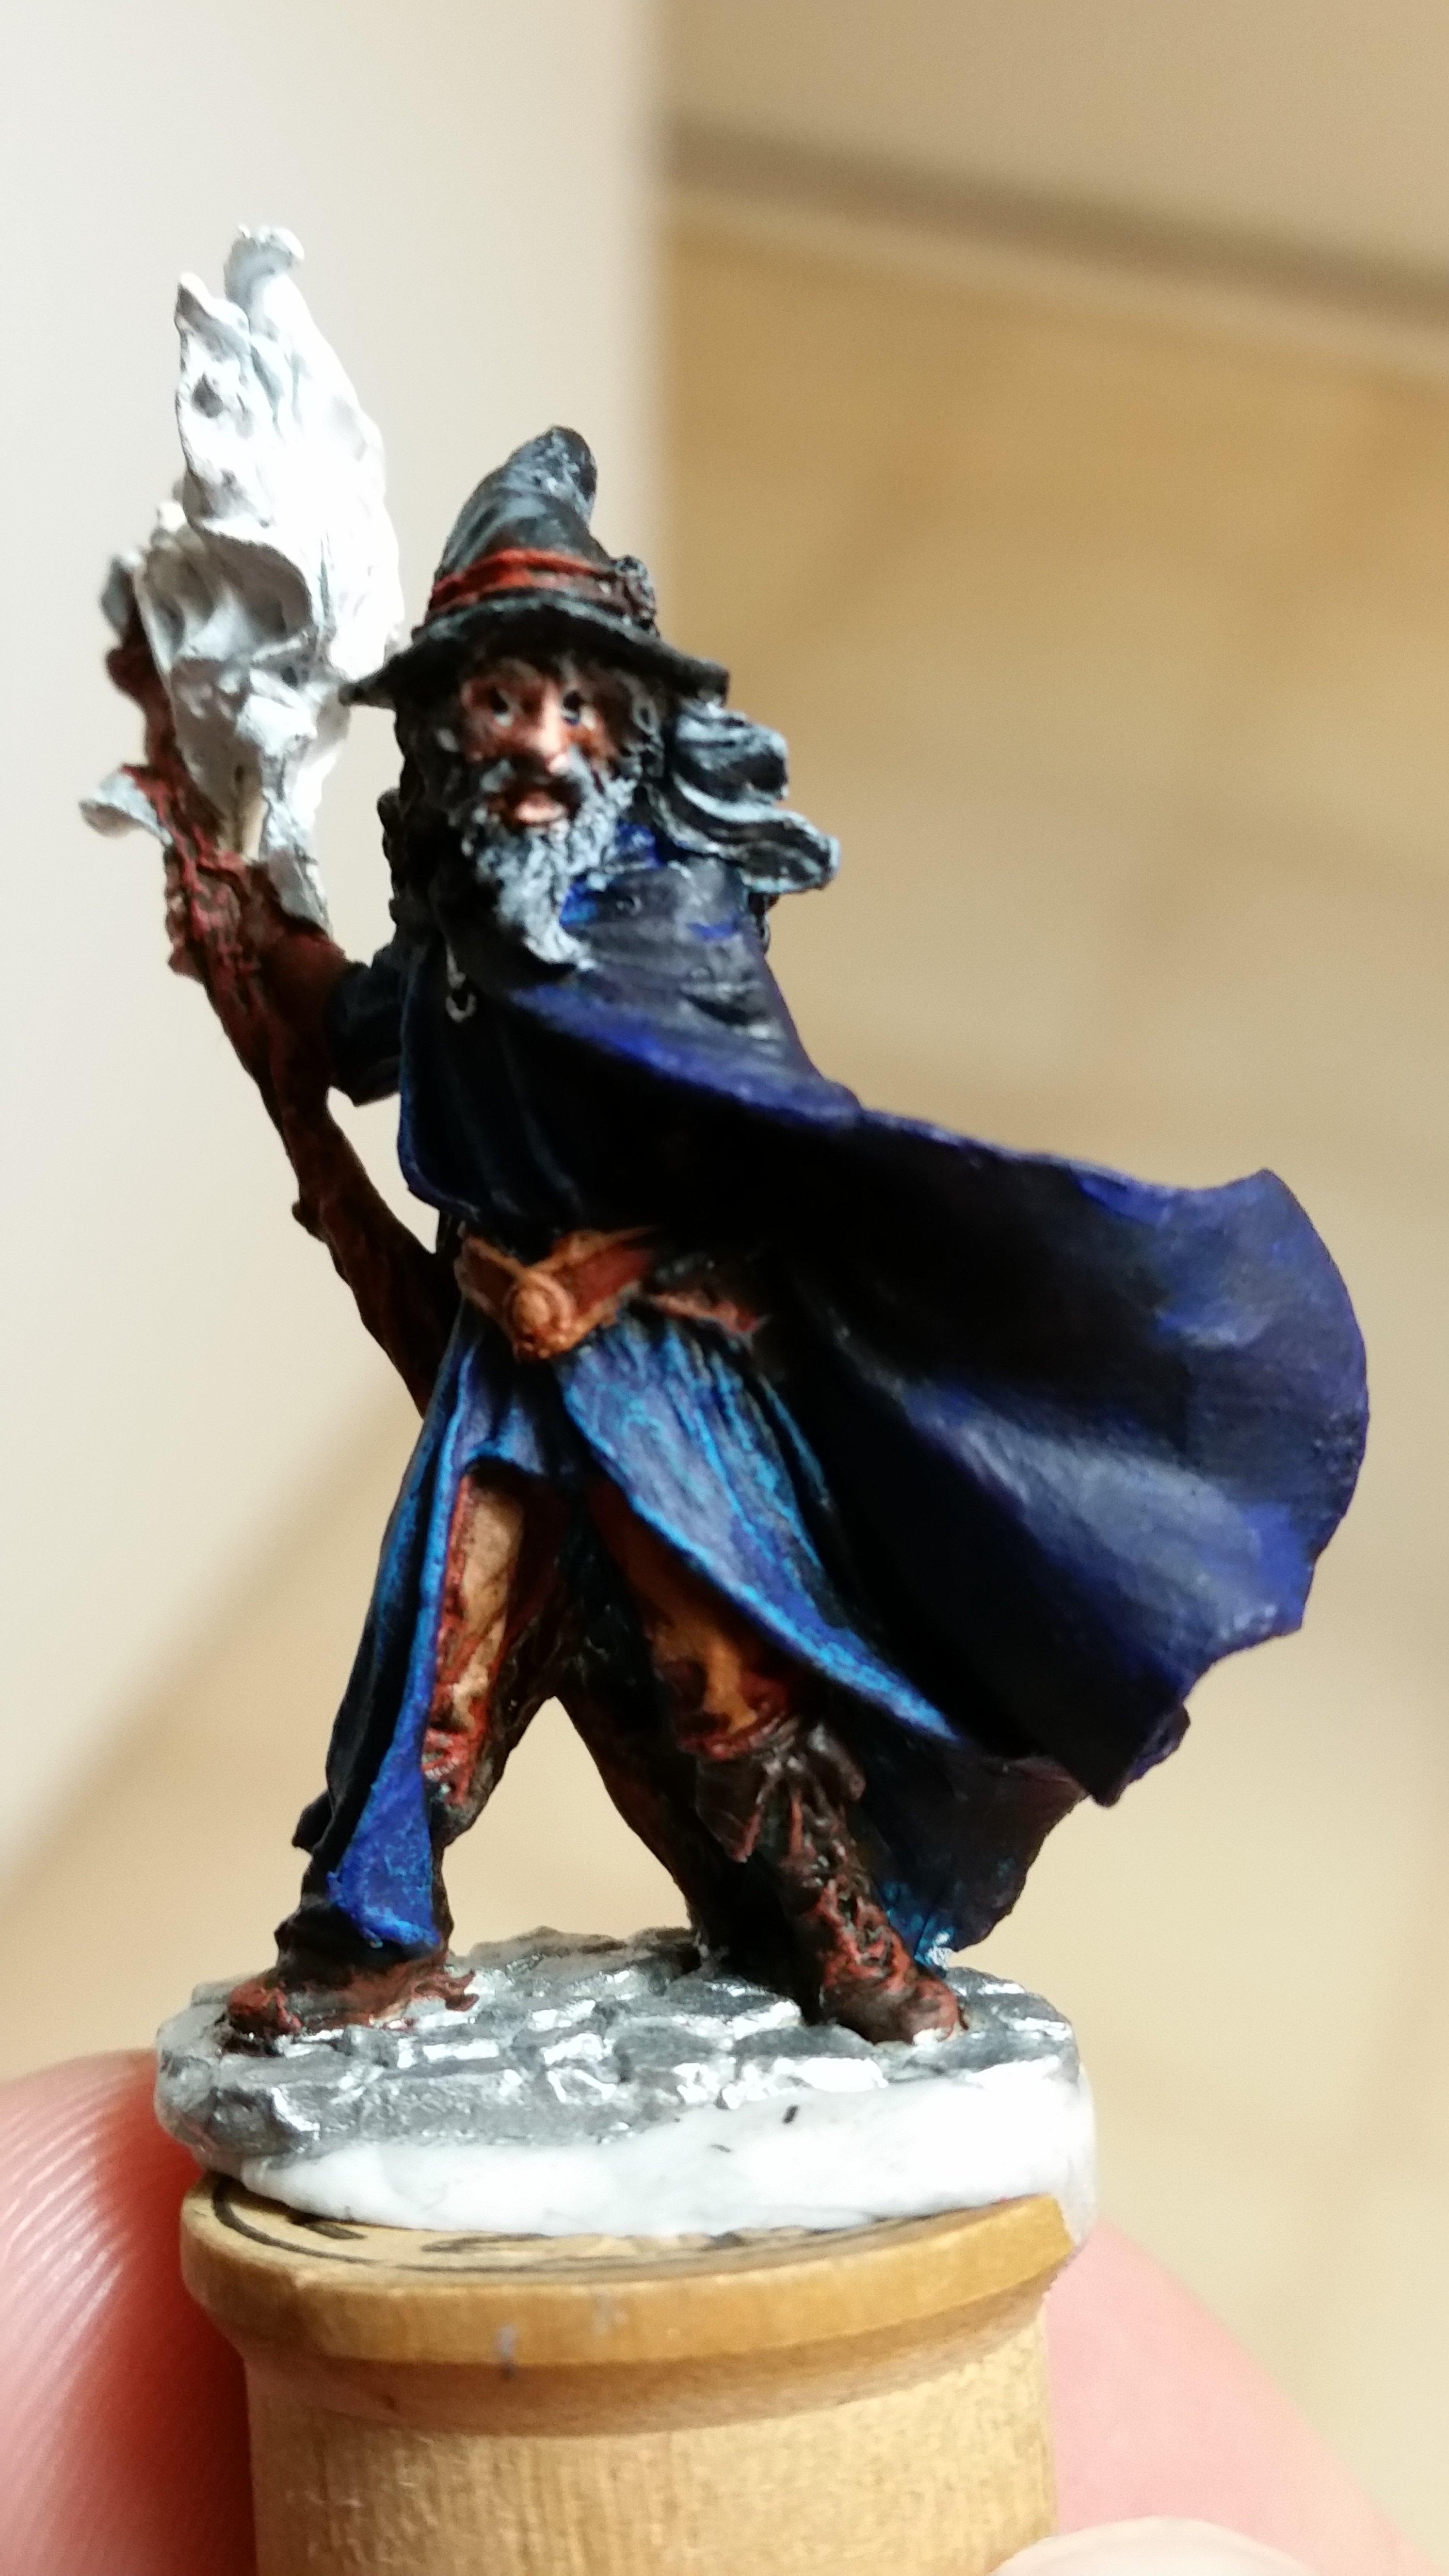 Noob Mage By Joshcorpuz85 Female Druid Witch Sorceress: 01601 Domur High Mage